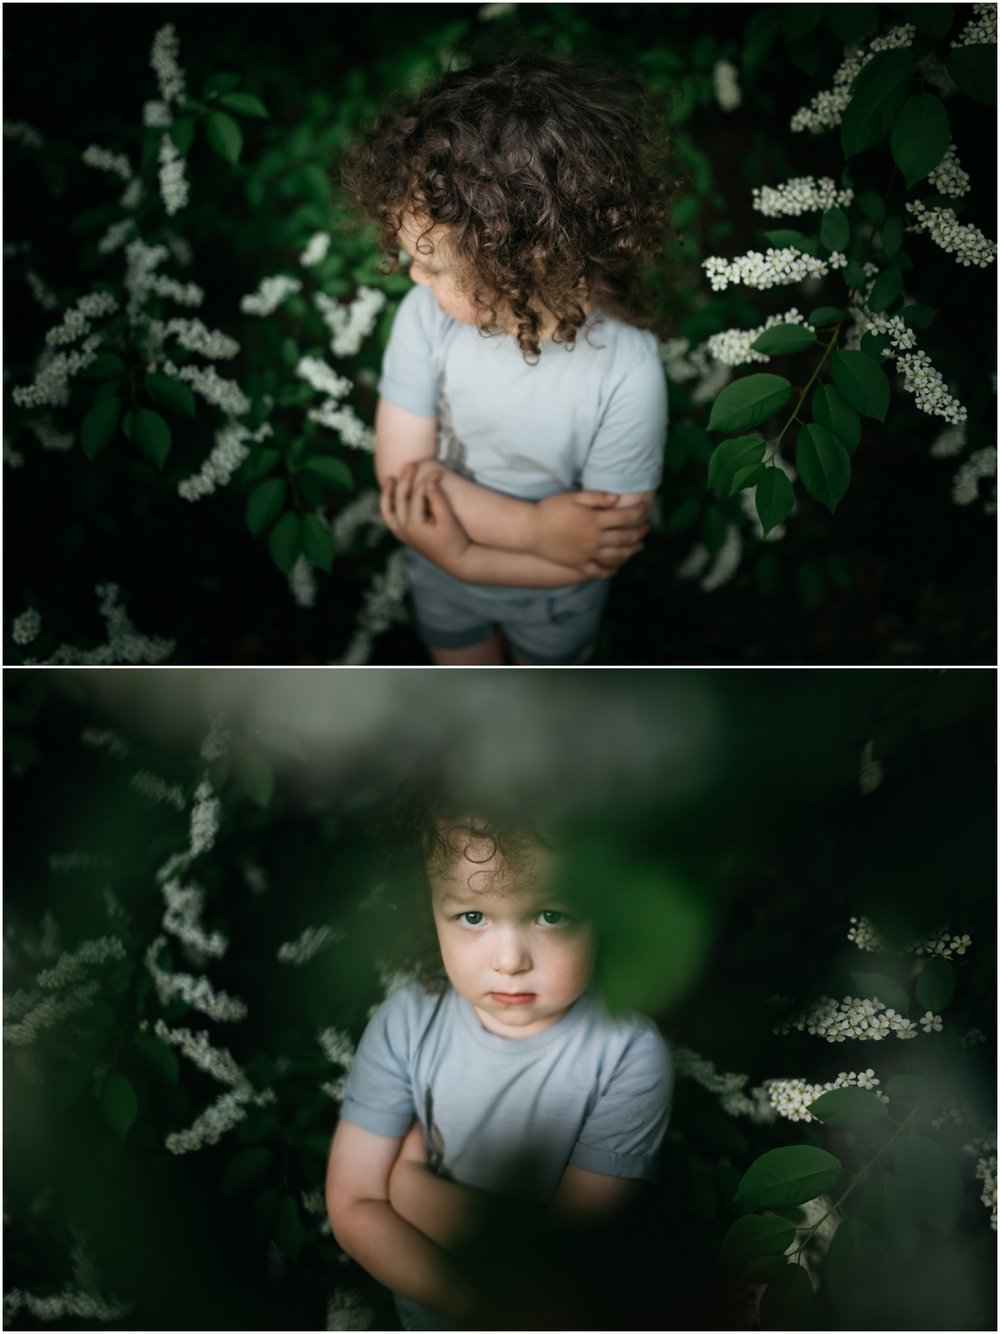 Edmonton Lifestyle Child Photographer - Best of 2016 - Blossoms preschooler Toddler Spring